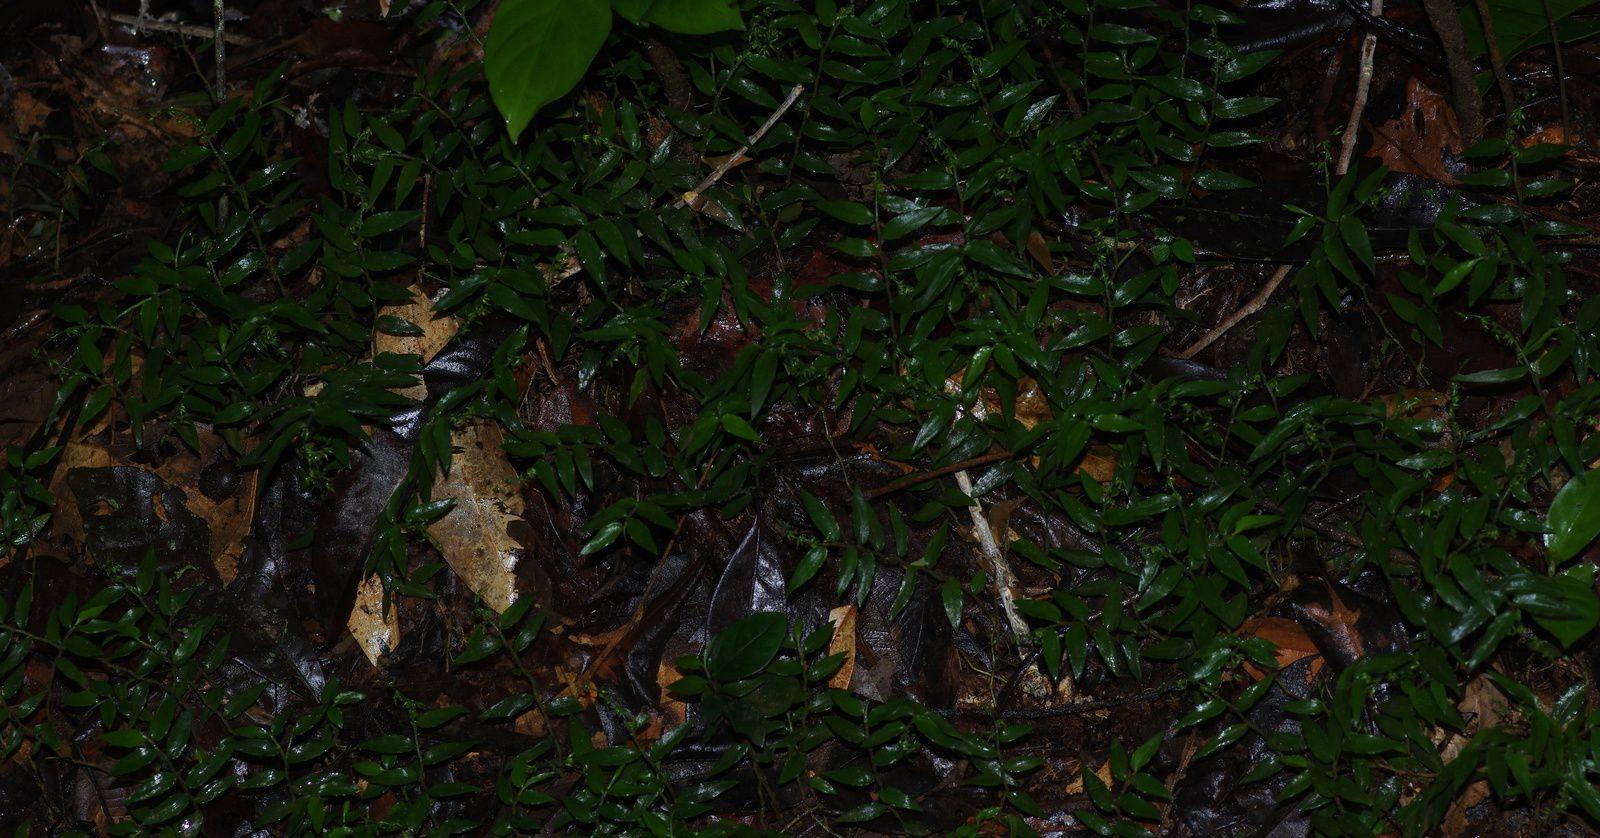 Ichnanthus tenuis